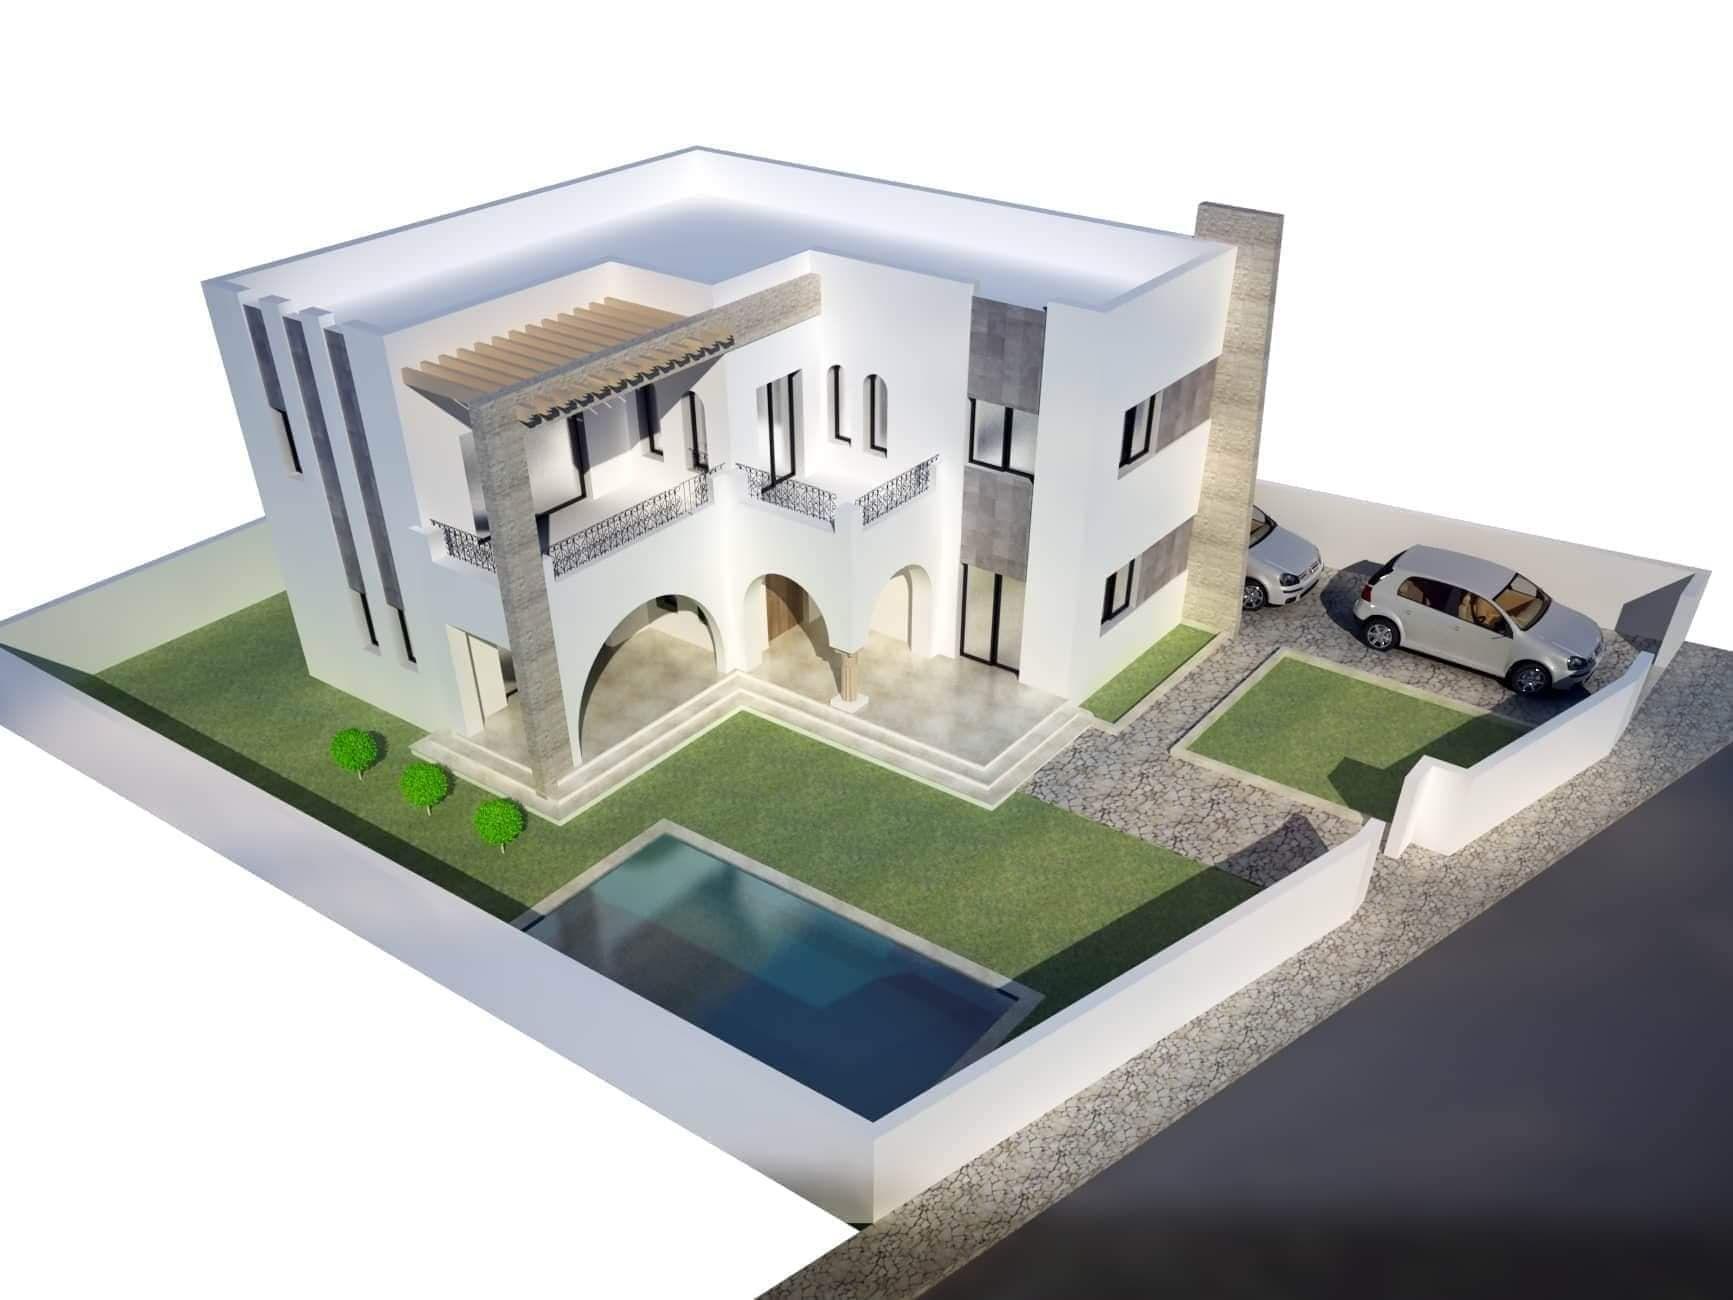 Villa brunella 2 réf:  villa brunella 2 réf: